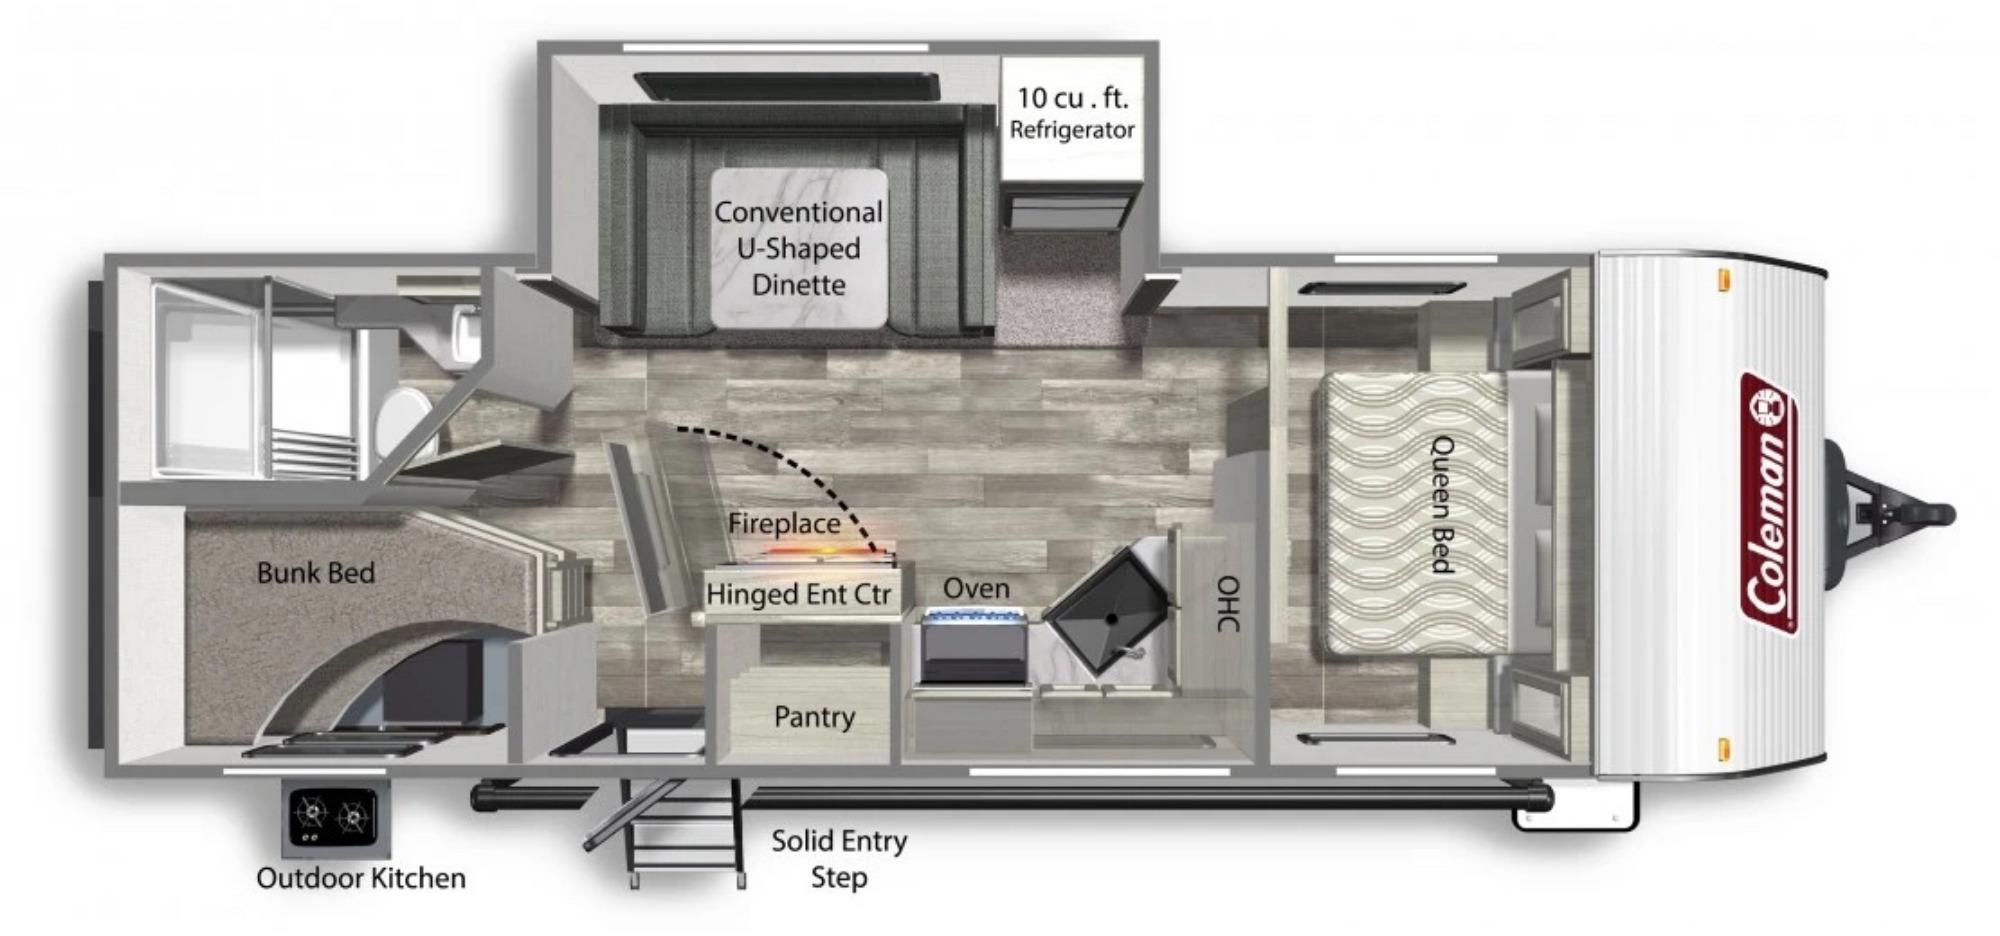 View Floor Plan for 2022 COLEMAN COLEMAN LANTERN 242BH